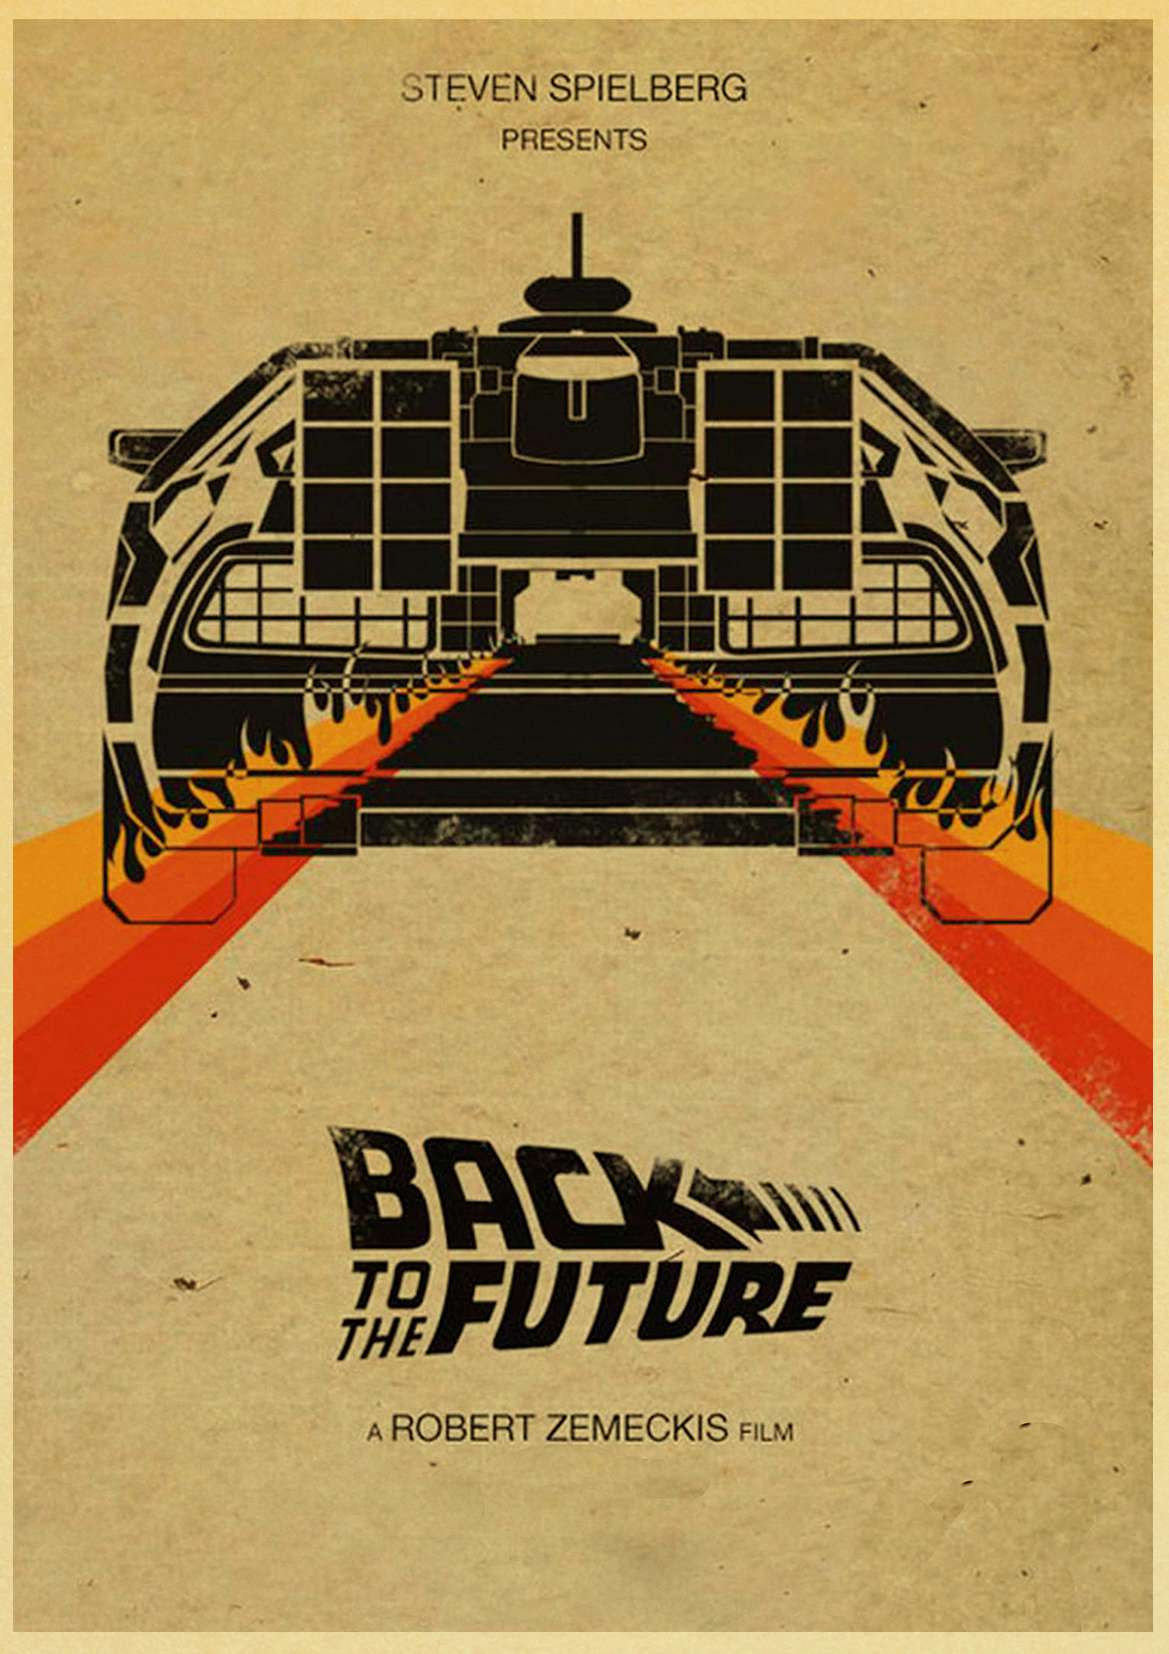 HTB1eo2vlbGYBuNjy0Foq6AiBFXaw Sci-fi Back to The Future Film Propaganda Retro Kraft Poster Decorative DIY Wall Canvas Sticker Home Bar Art Posters Decor